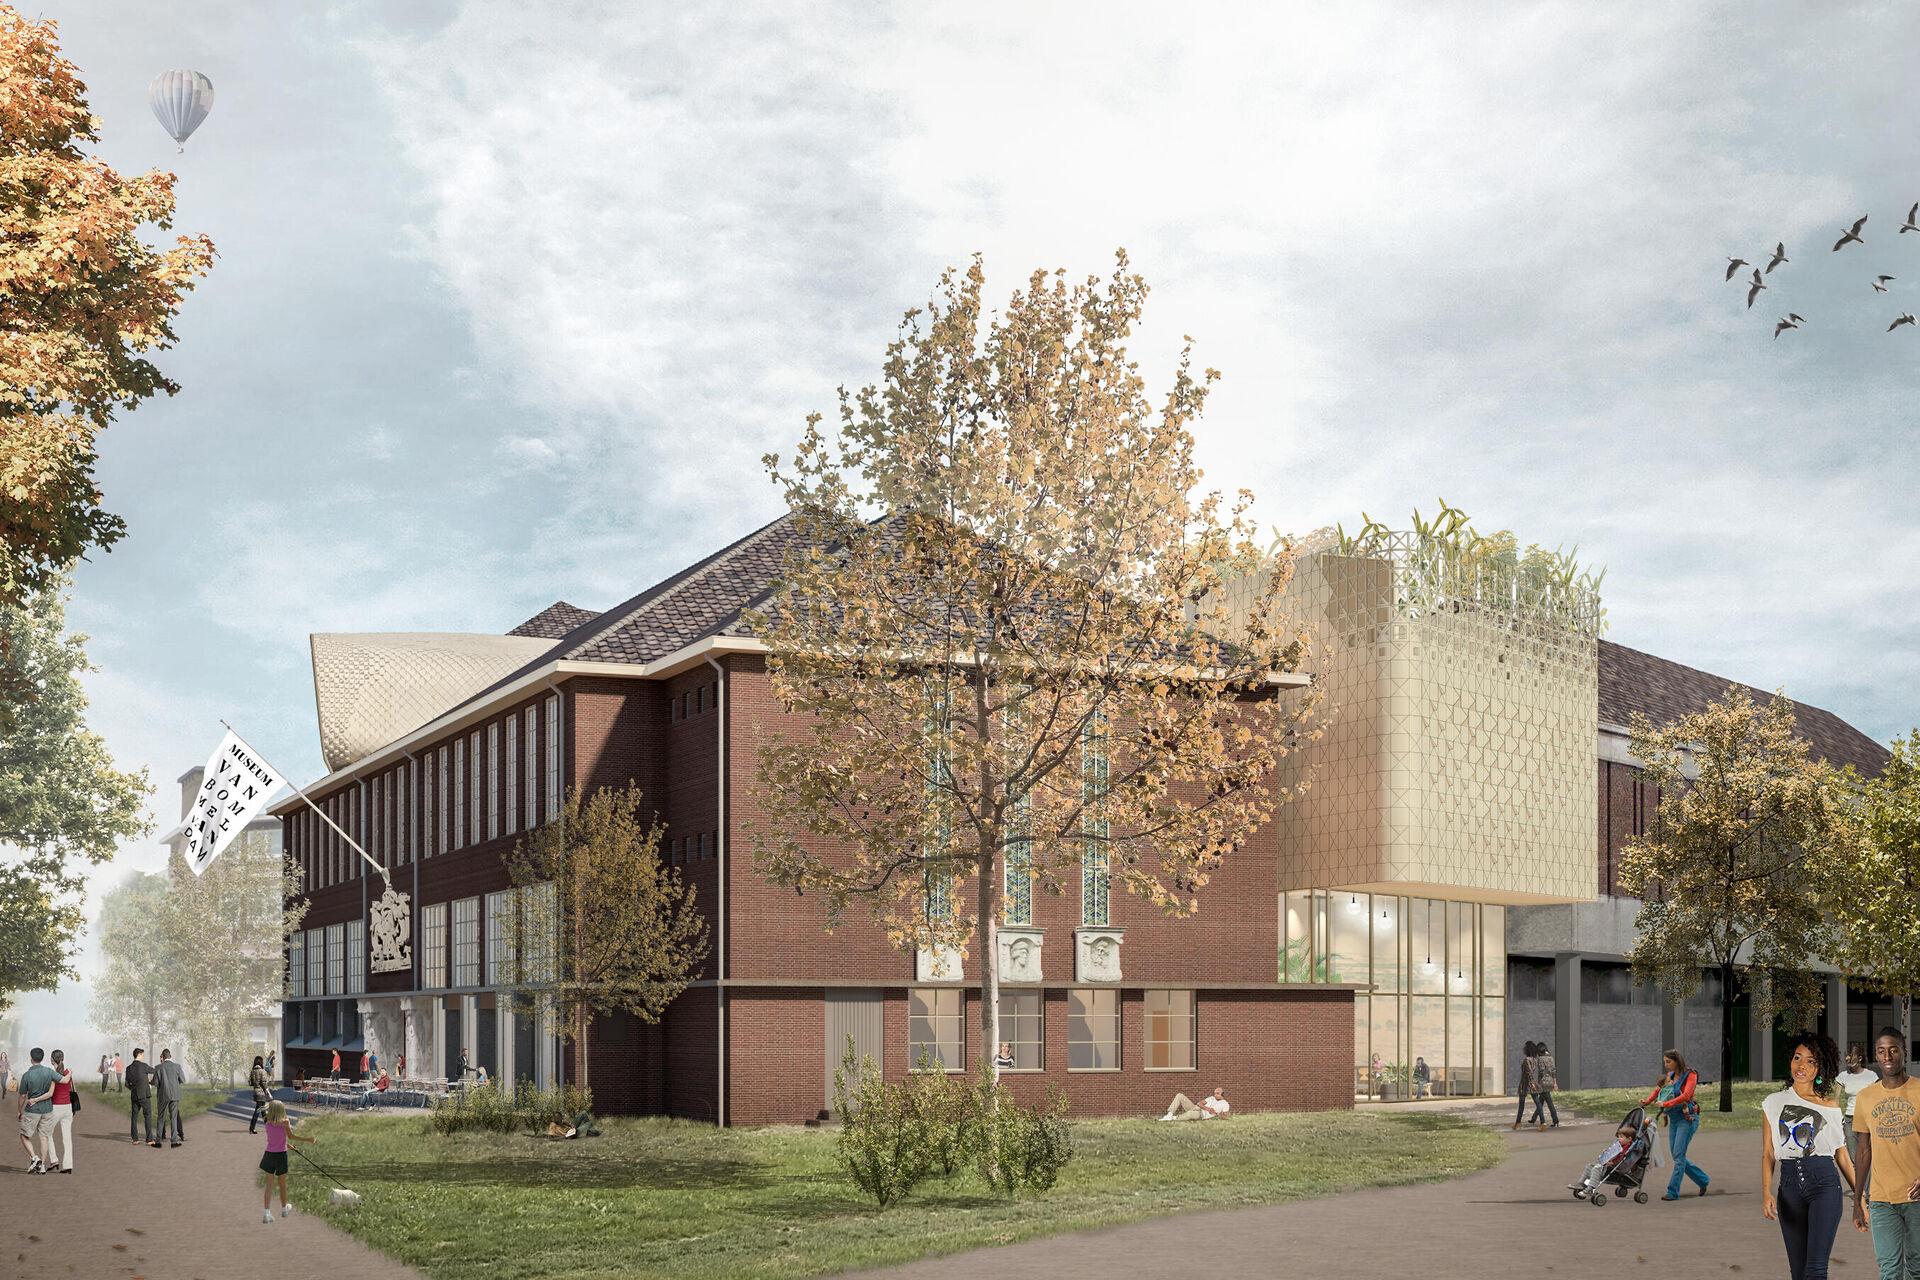 Enthusiastic response to the final design for Museum van Bommel van Dam